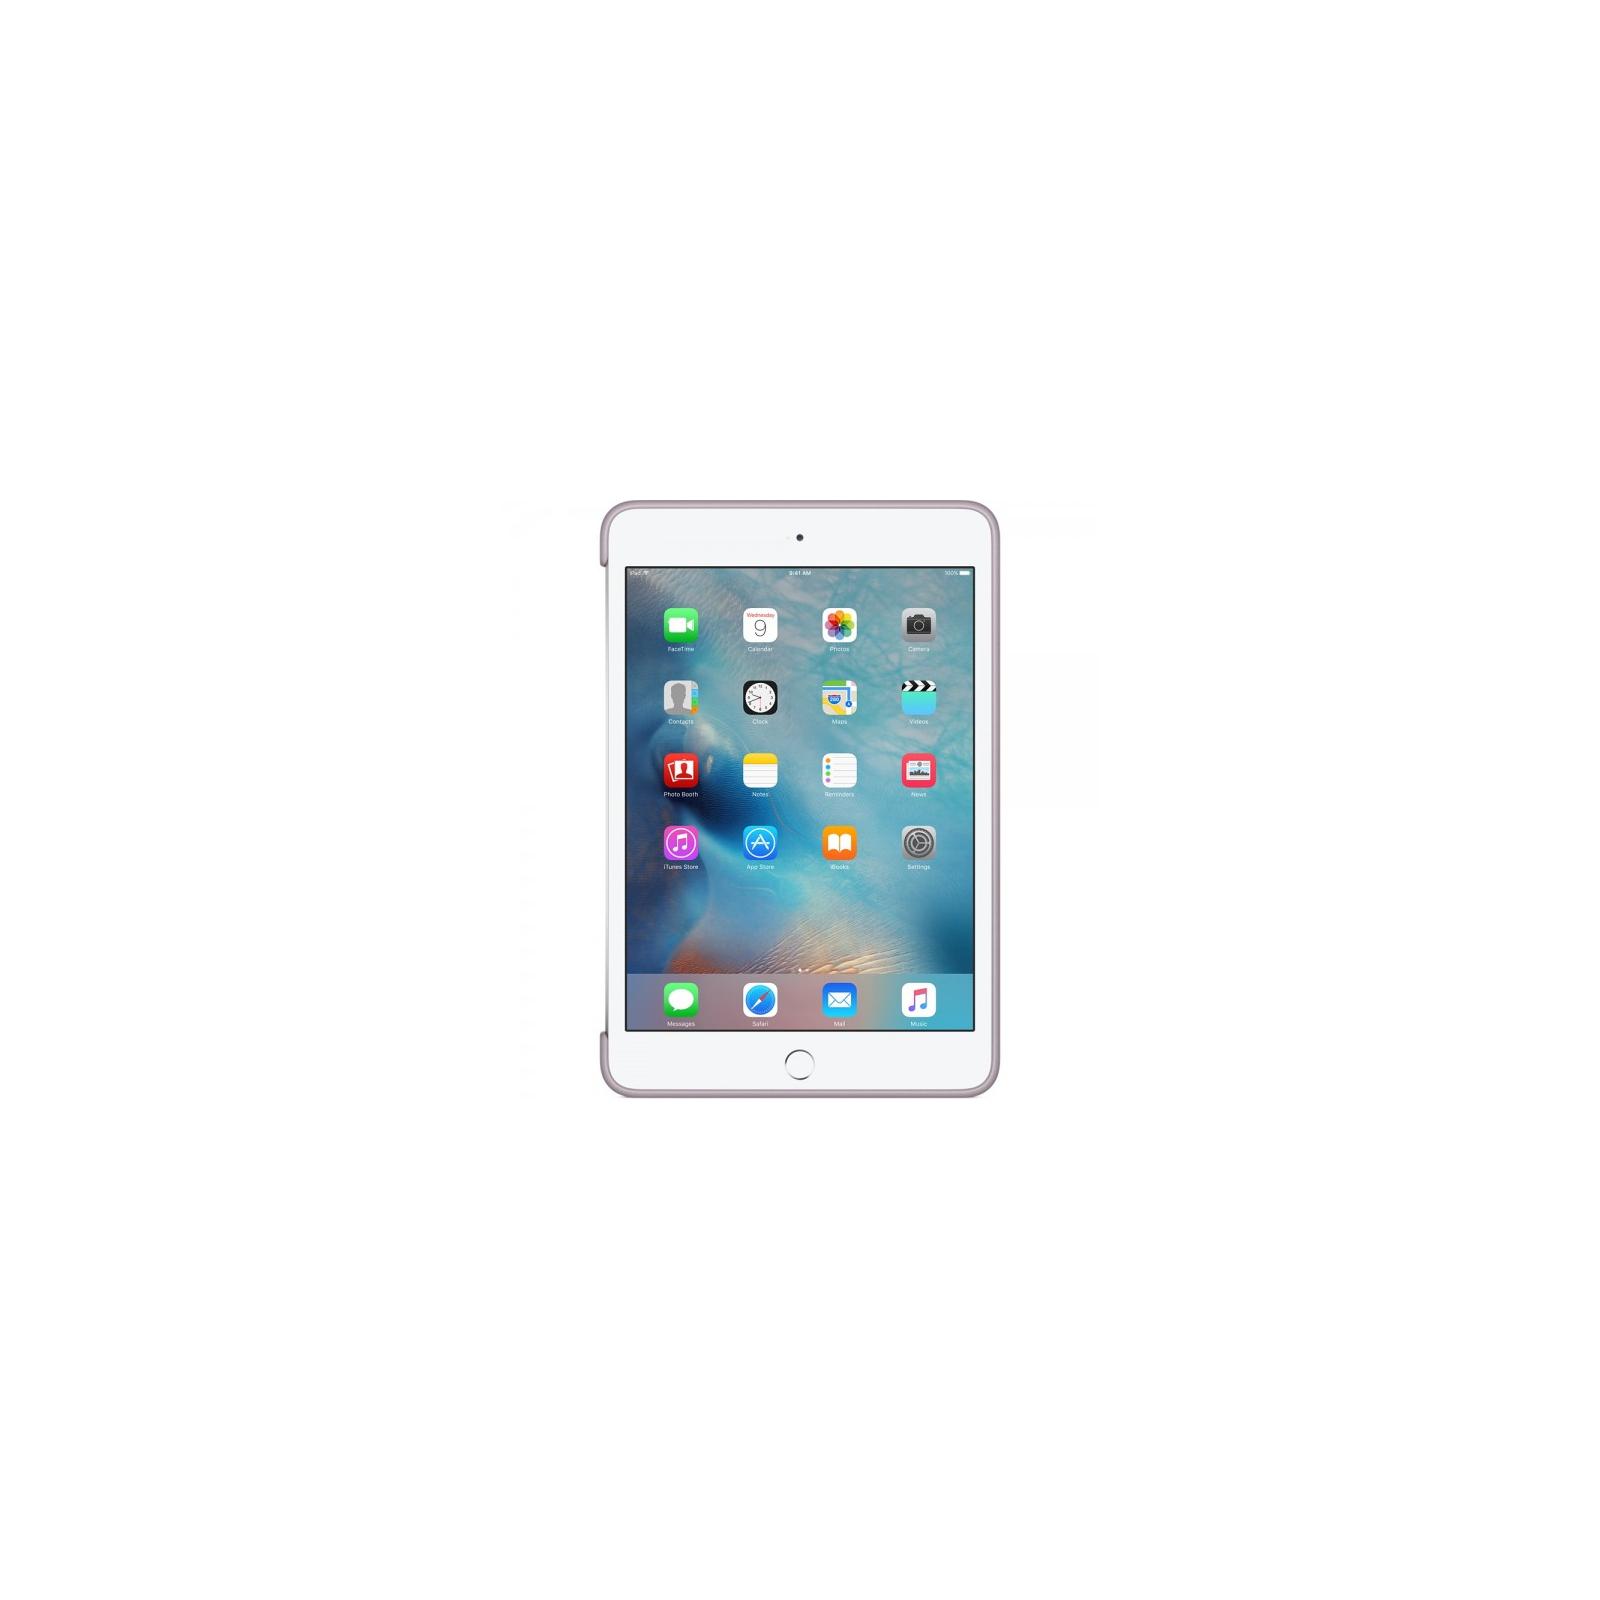 Чехол для планшета Apple iPad mini 4 Lavender (MLD62ZM/A) изображение 4